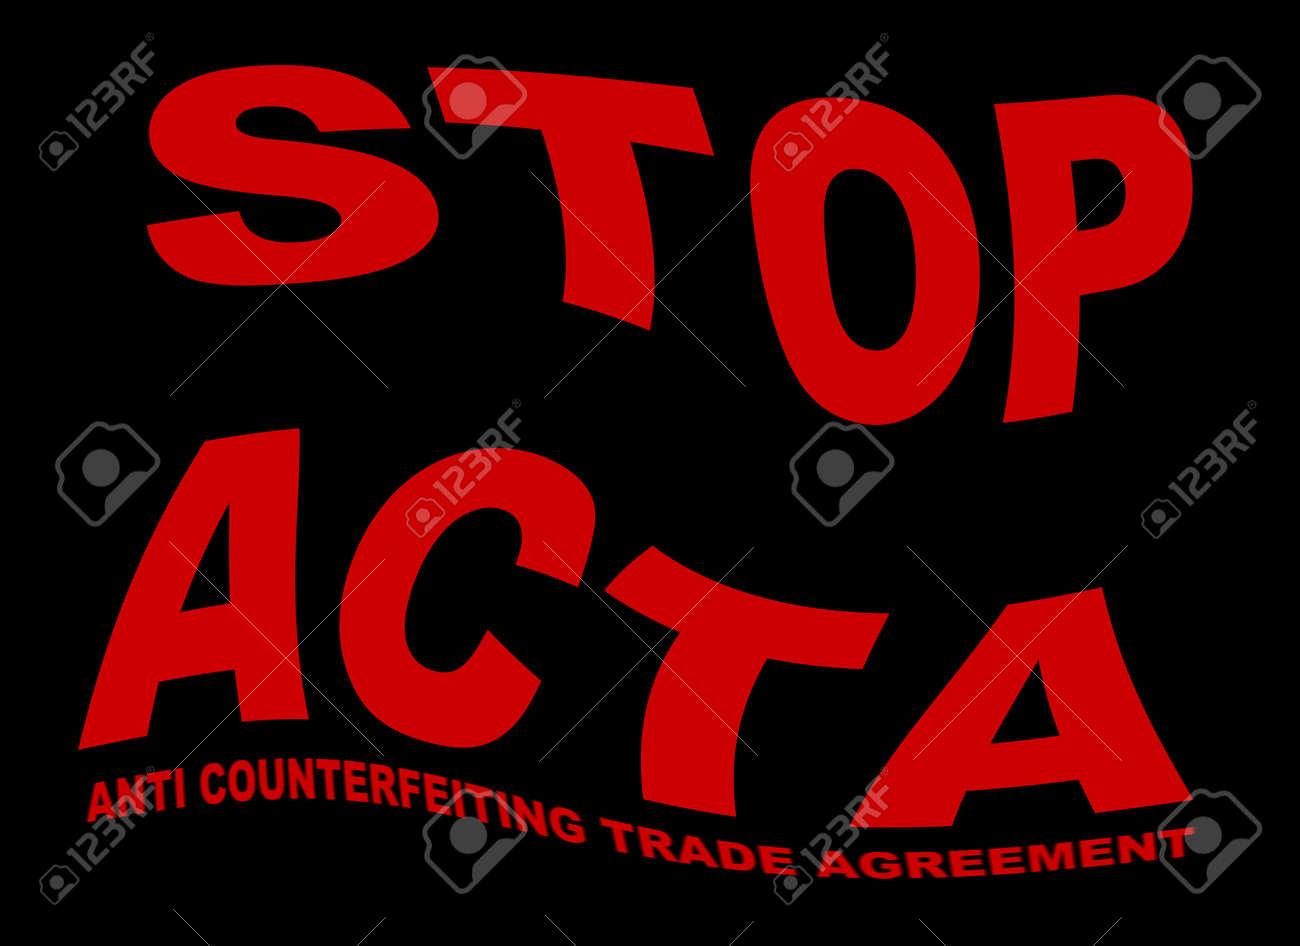 stop ACTA - anti-counterfeiting trade agreement Stock Photo - 12257824